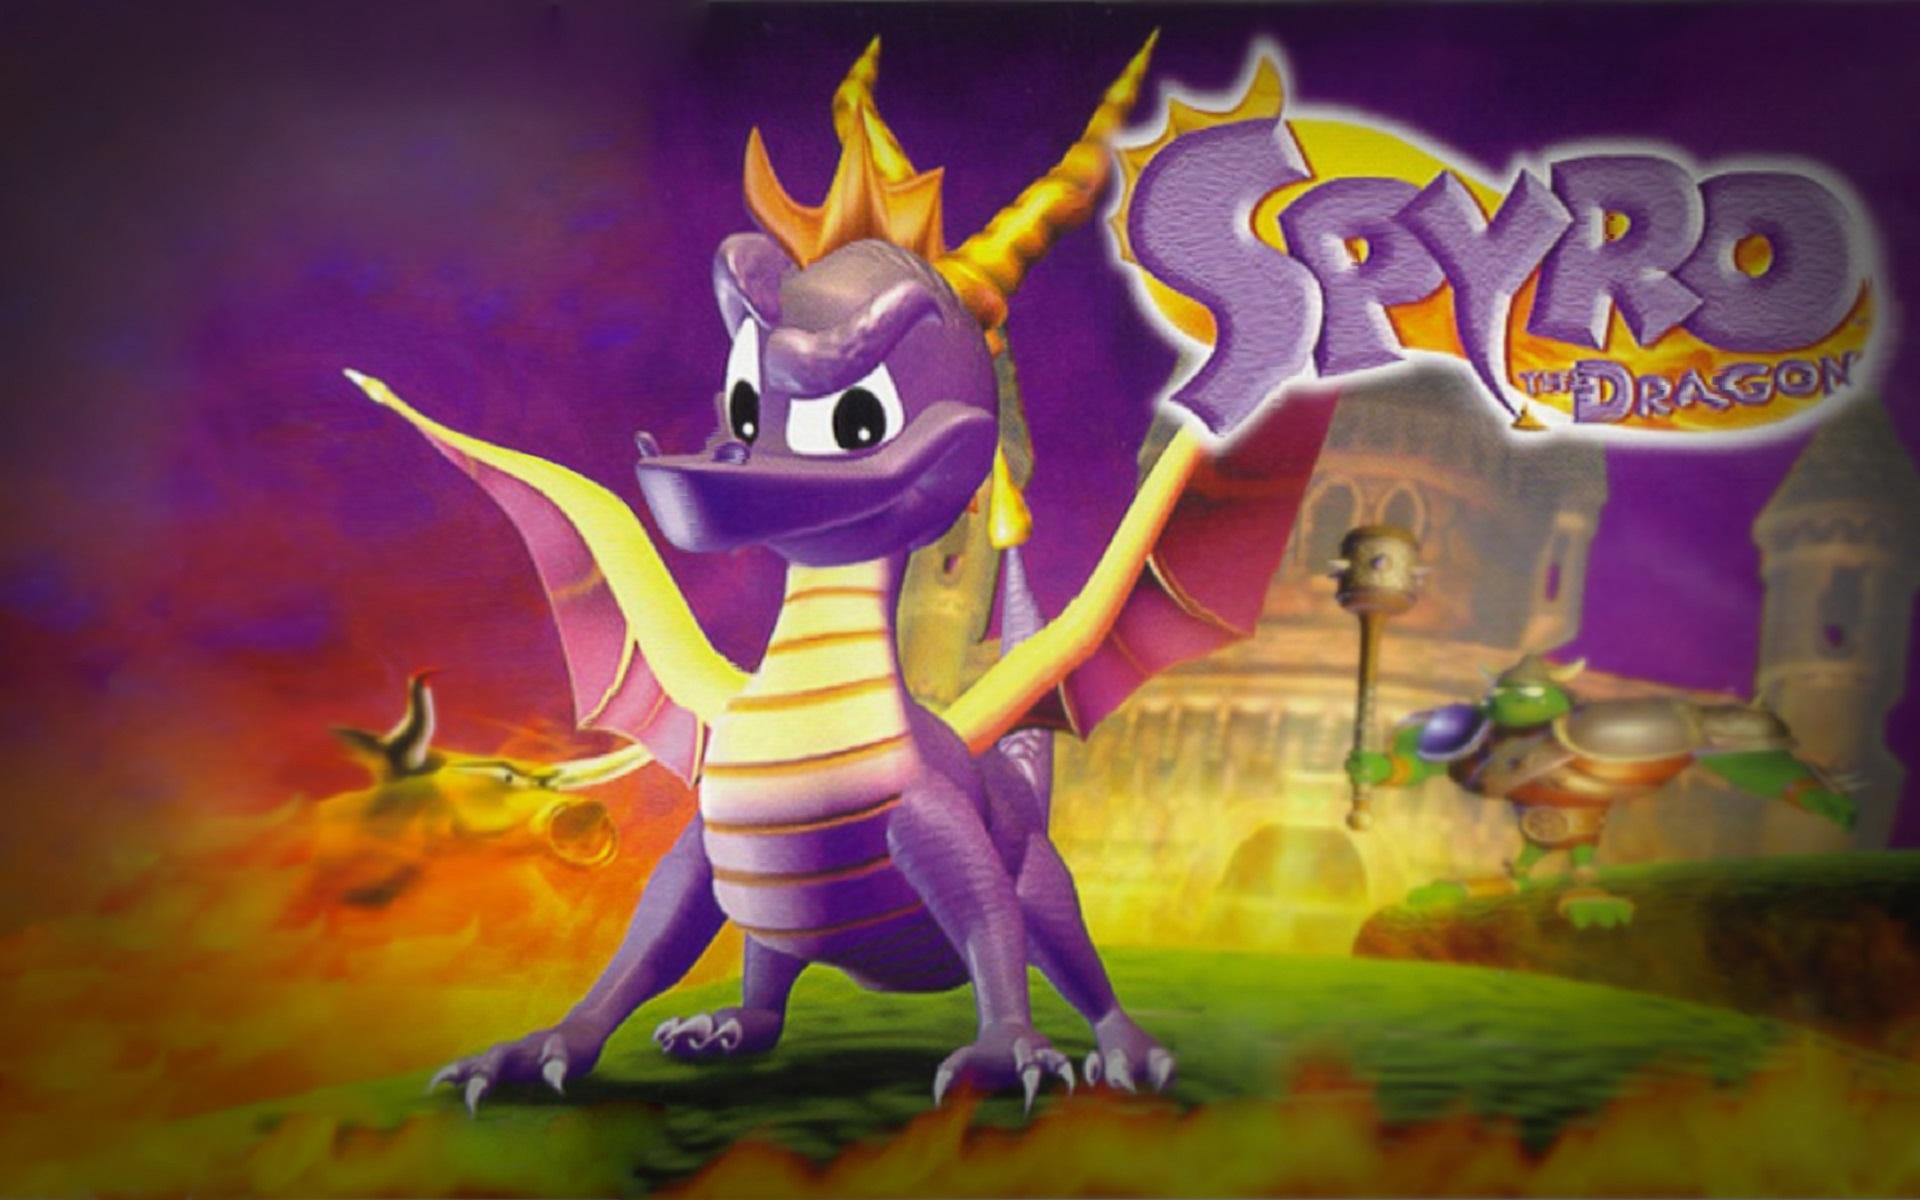 SOUND TEST: Spyro the Dragon Trilogy